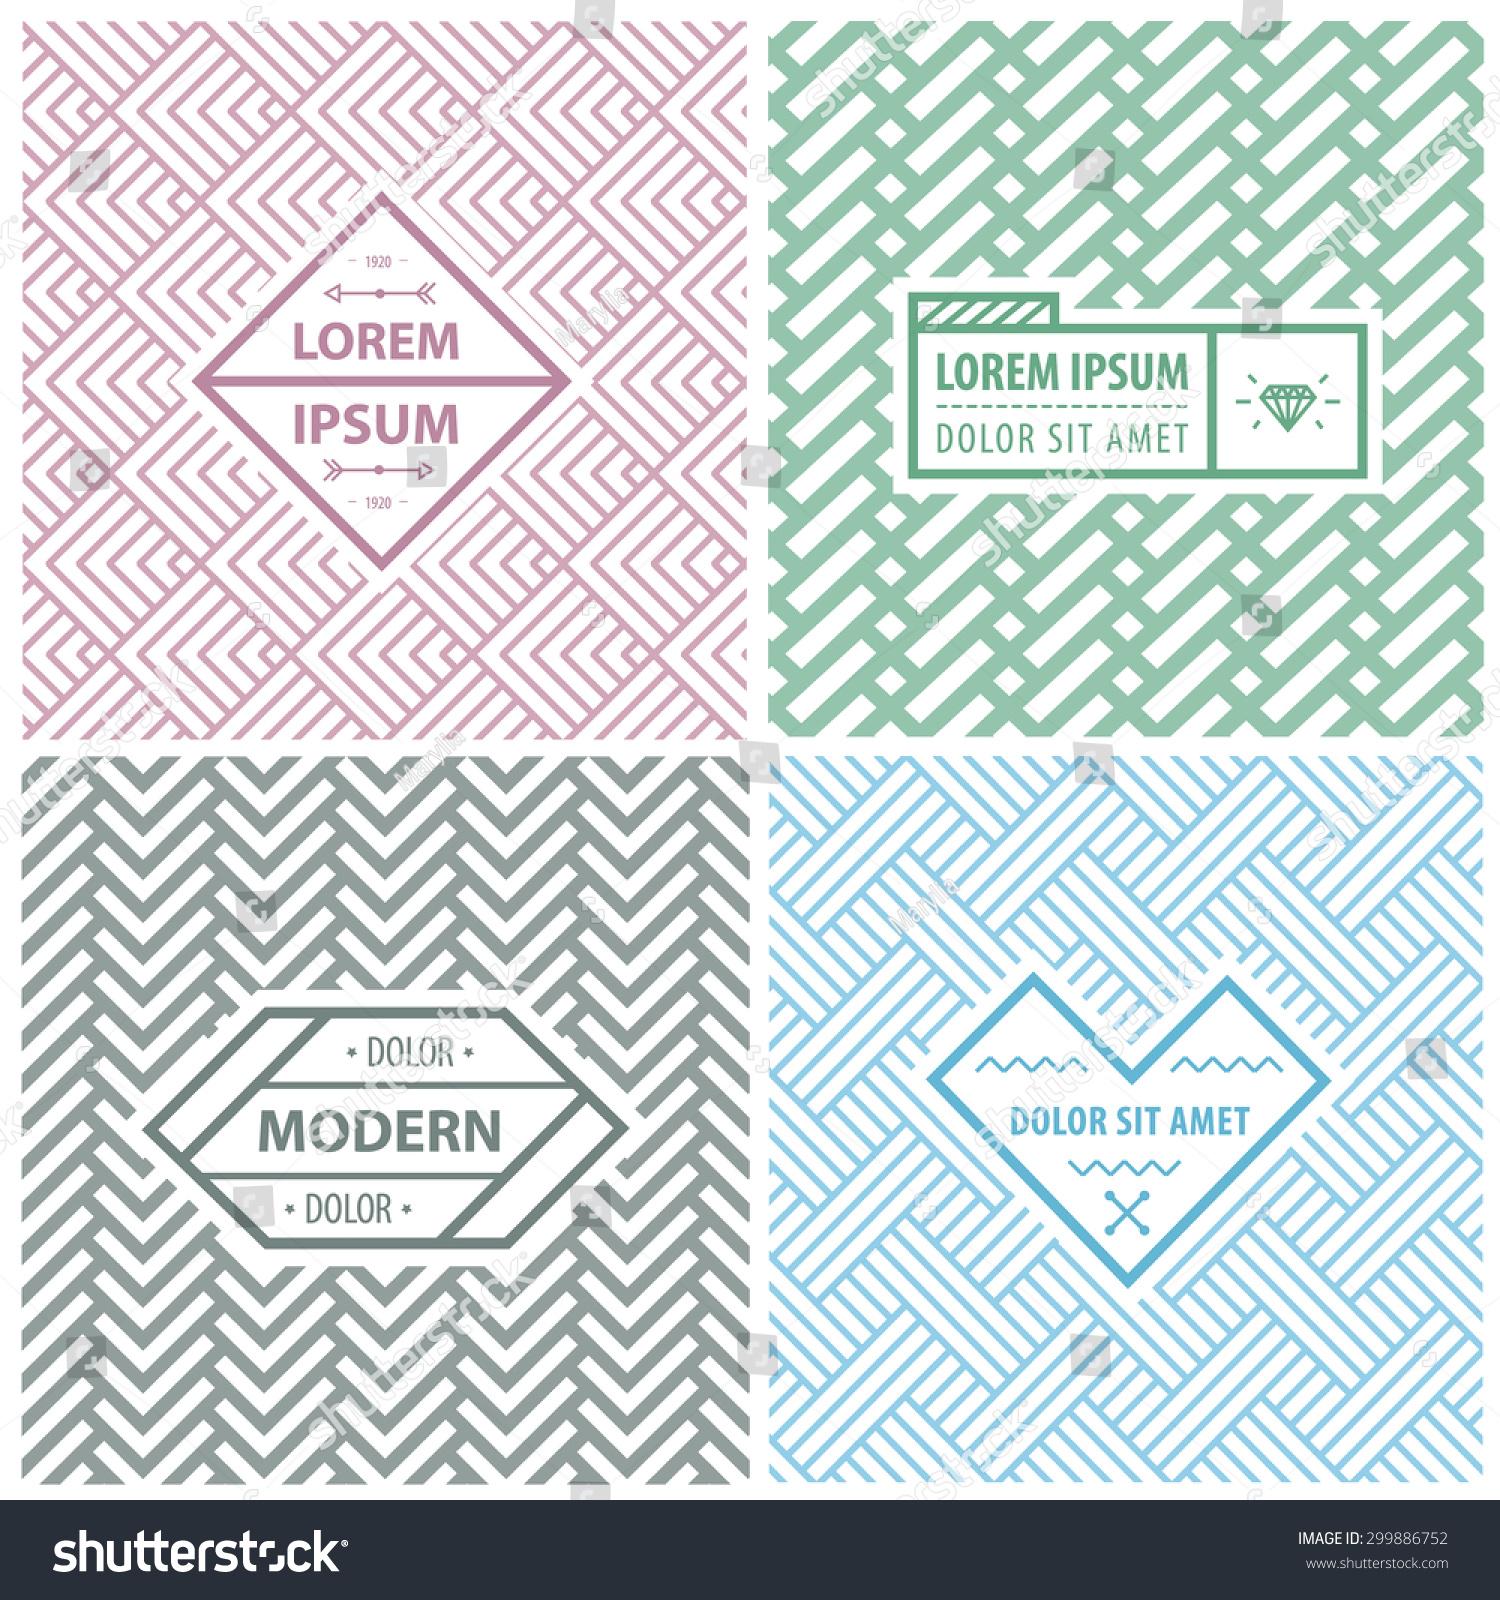 Line Graphic Design : Graphic design templates logo labels badges stock vector